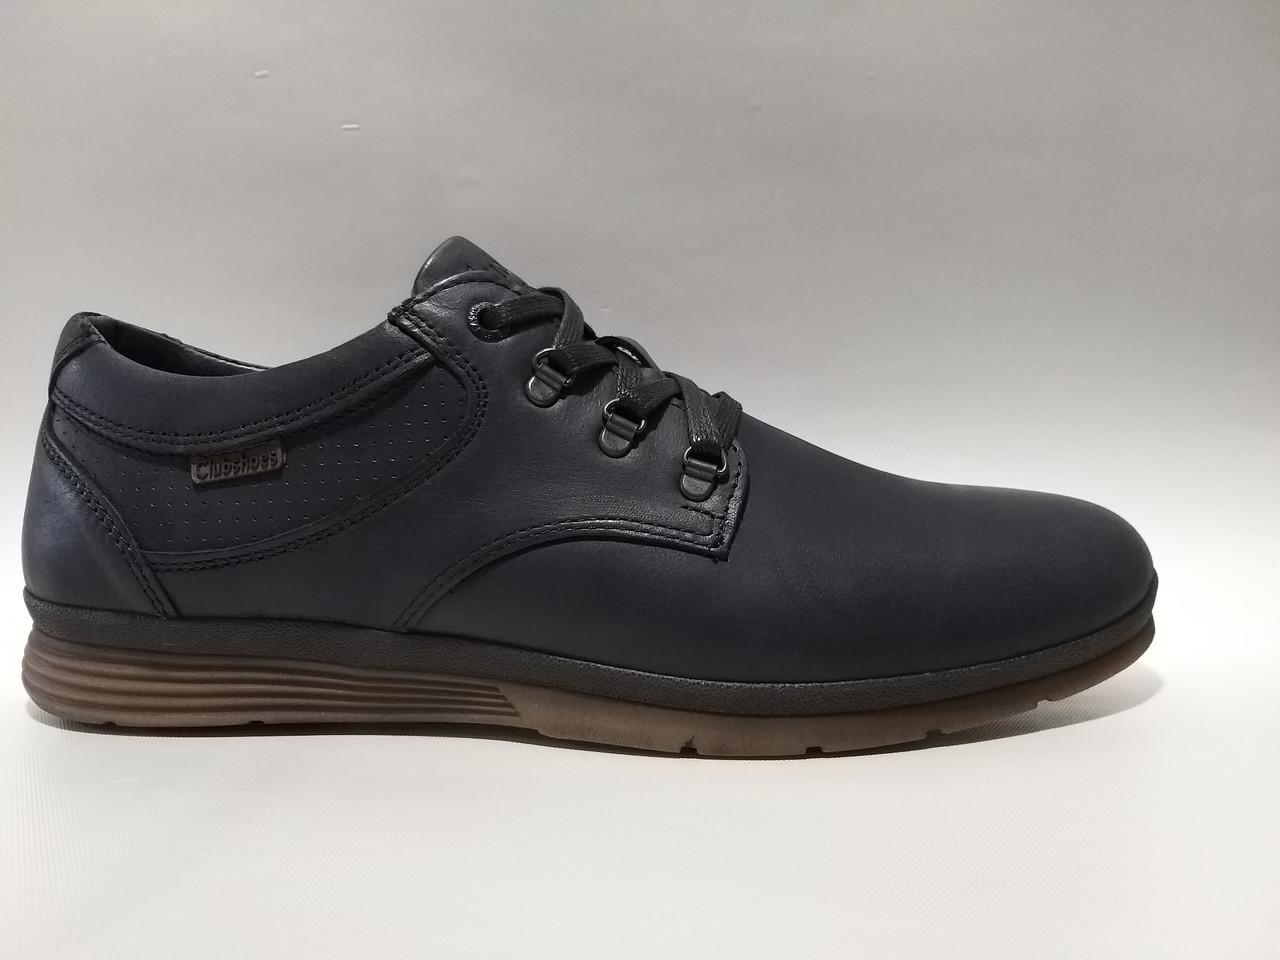 Туфли кроссовки мужские Clubshoes